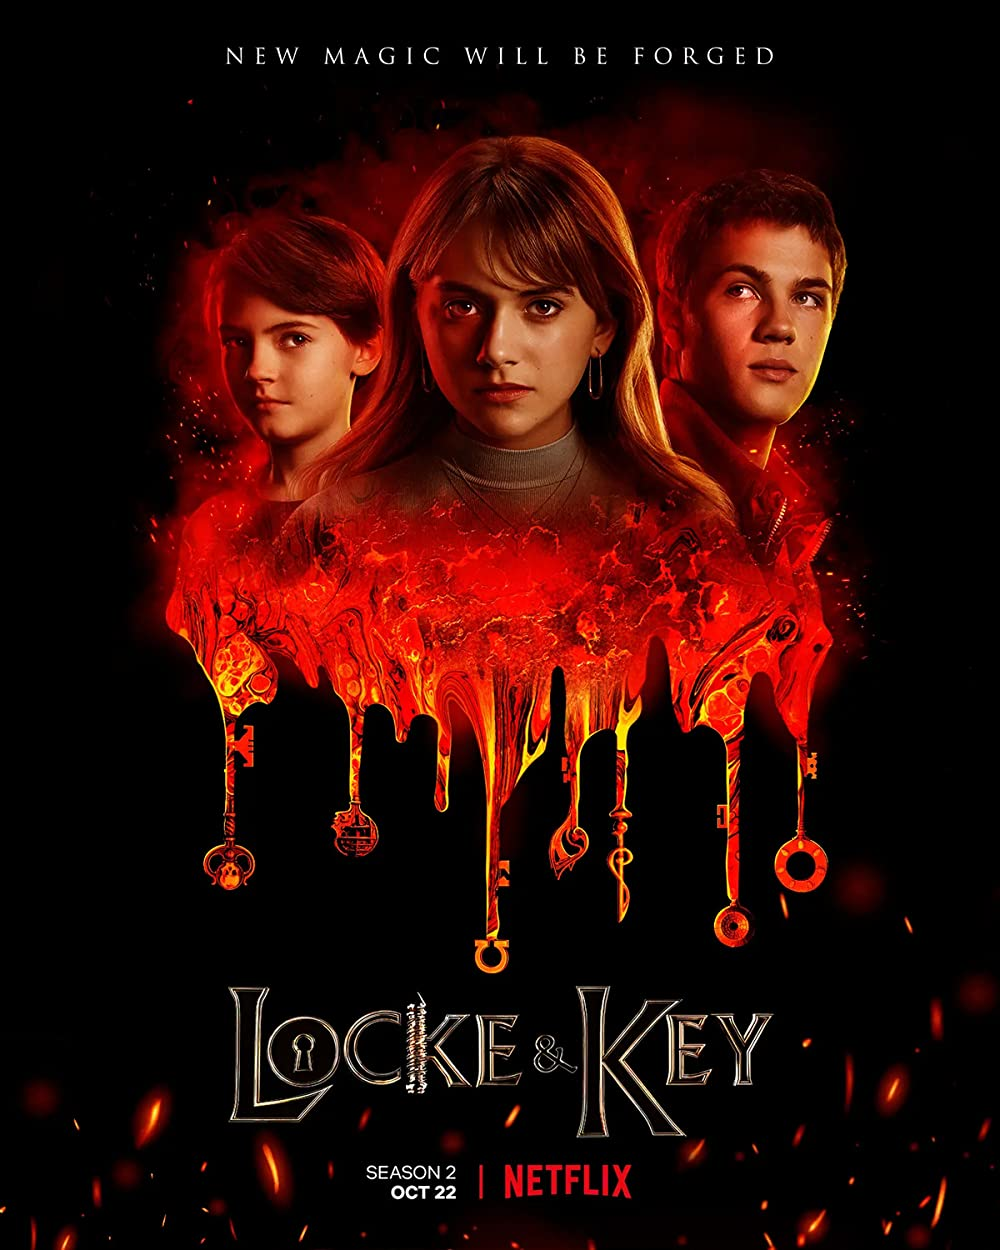 Locke & Key 2021 S02 Complete Hindi Dubbed NF Series 720p HDRip 3.31GB Download